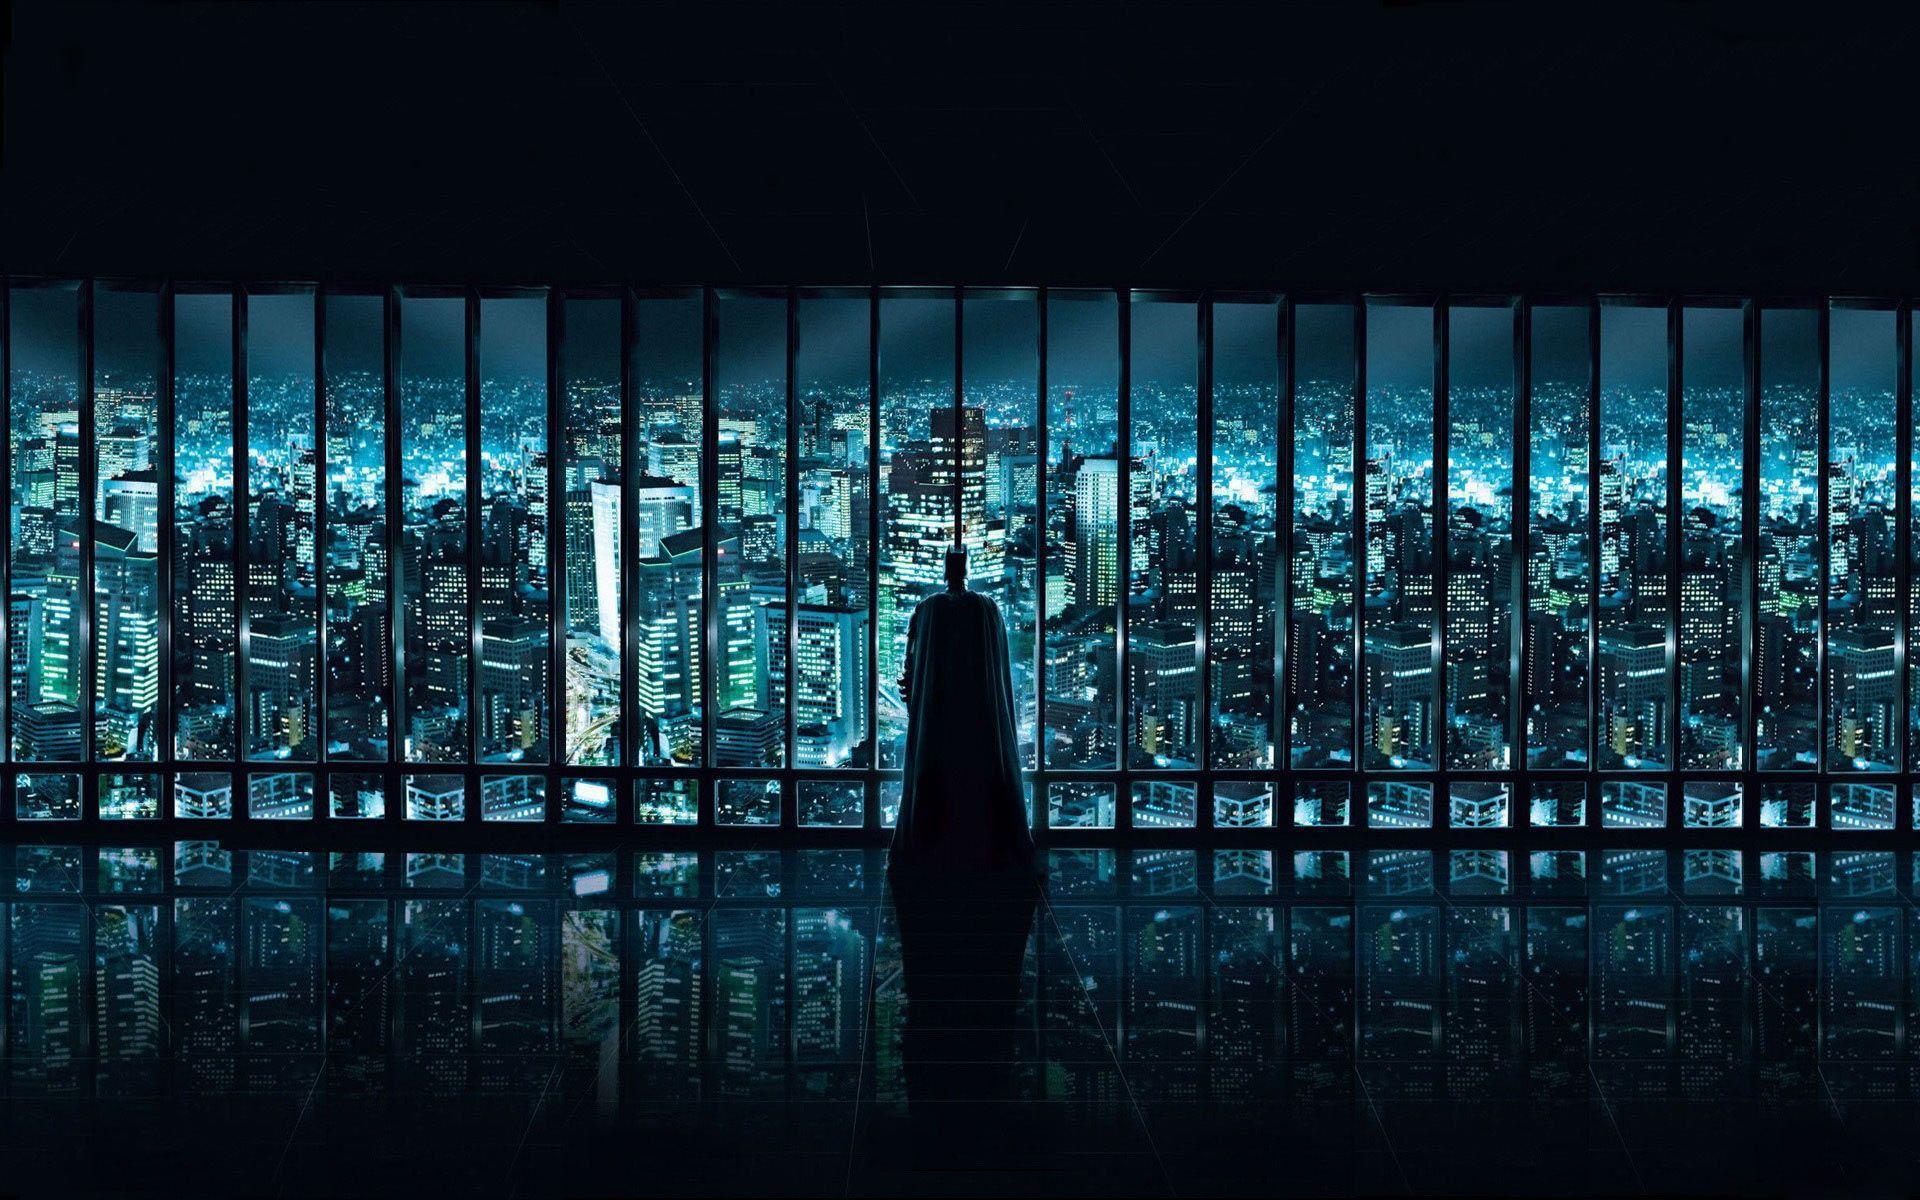 Desktop Wallpaper · Gallery · Movies & TV · New Batman movie ...